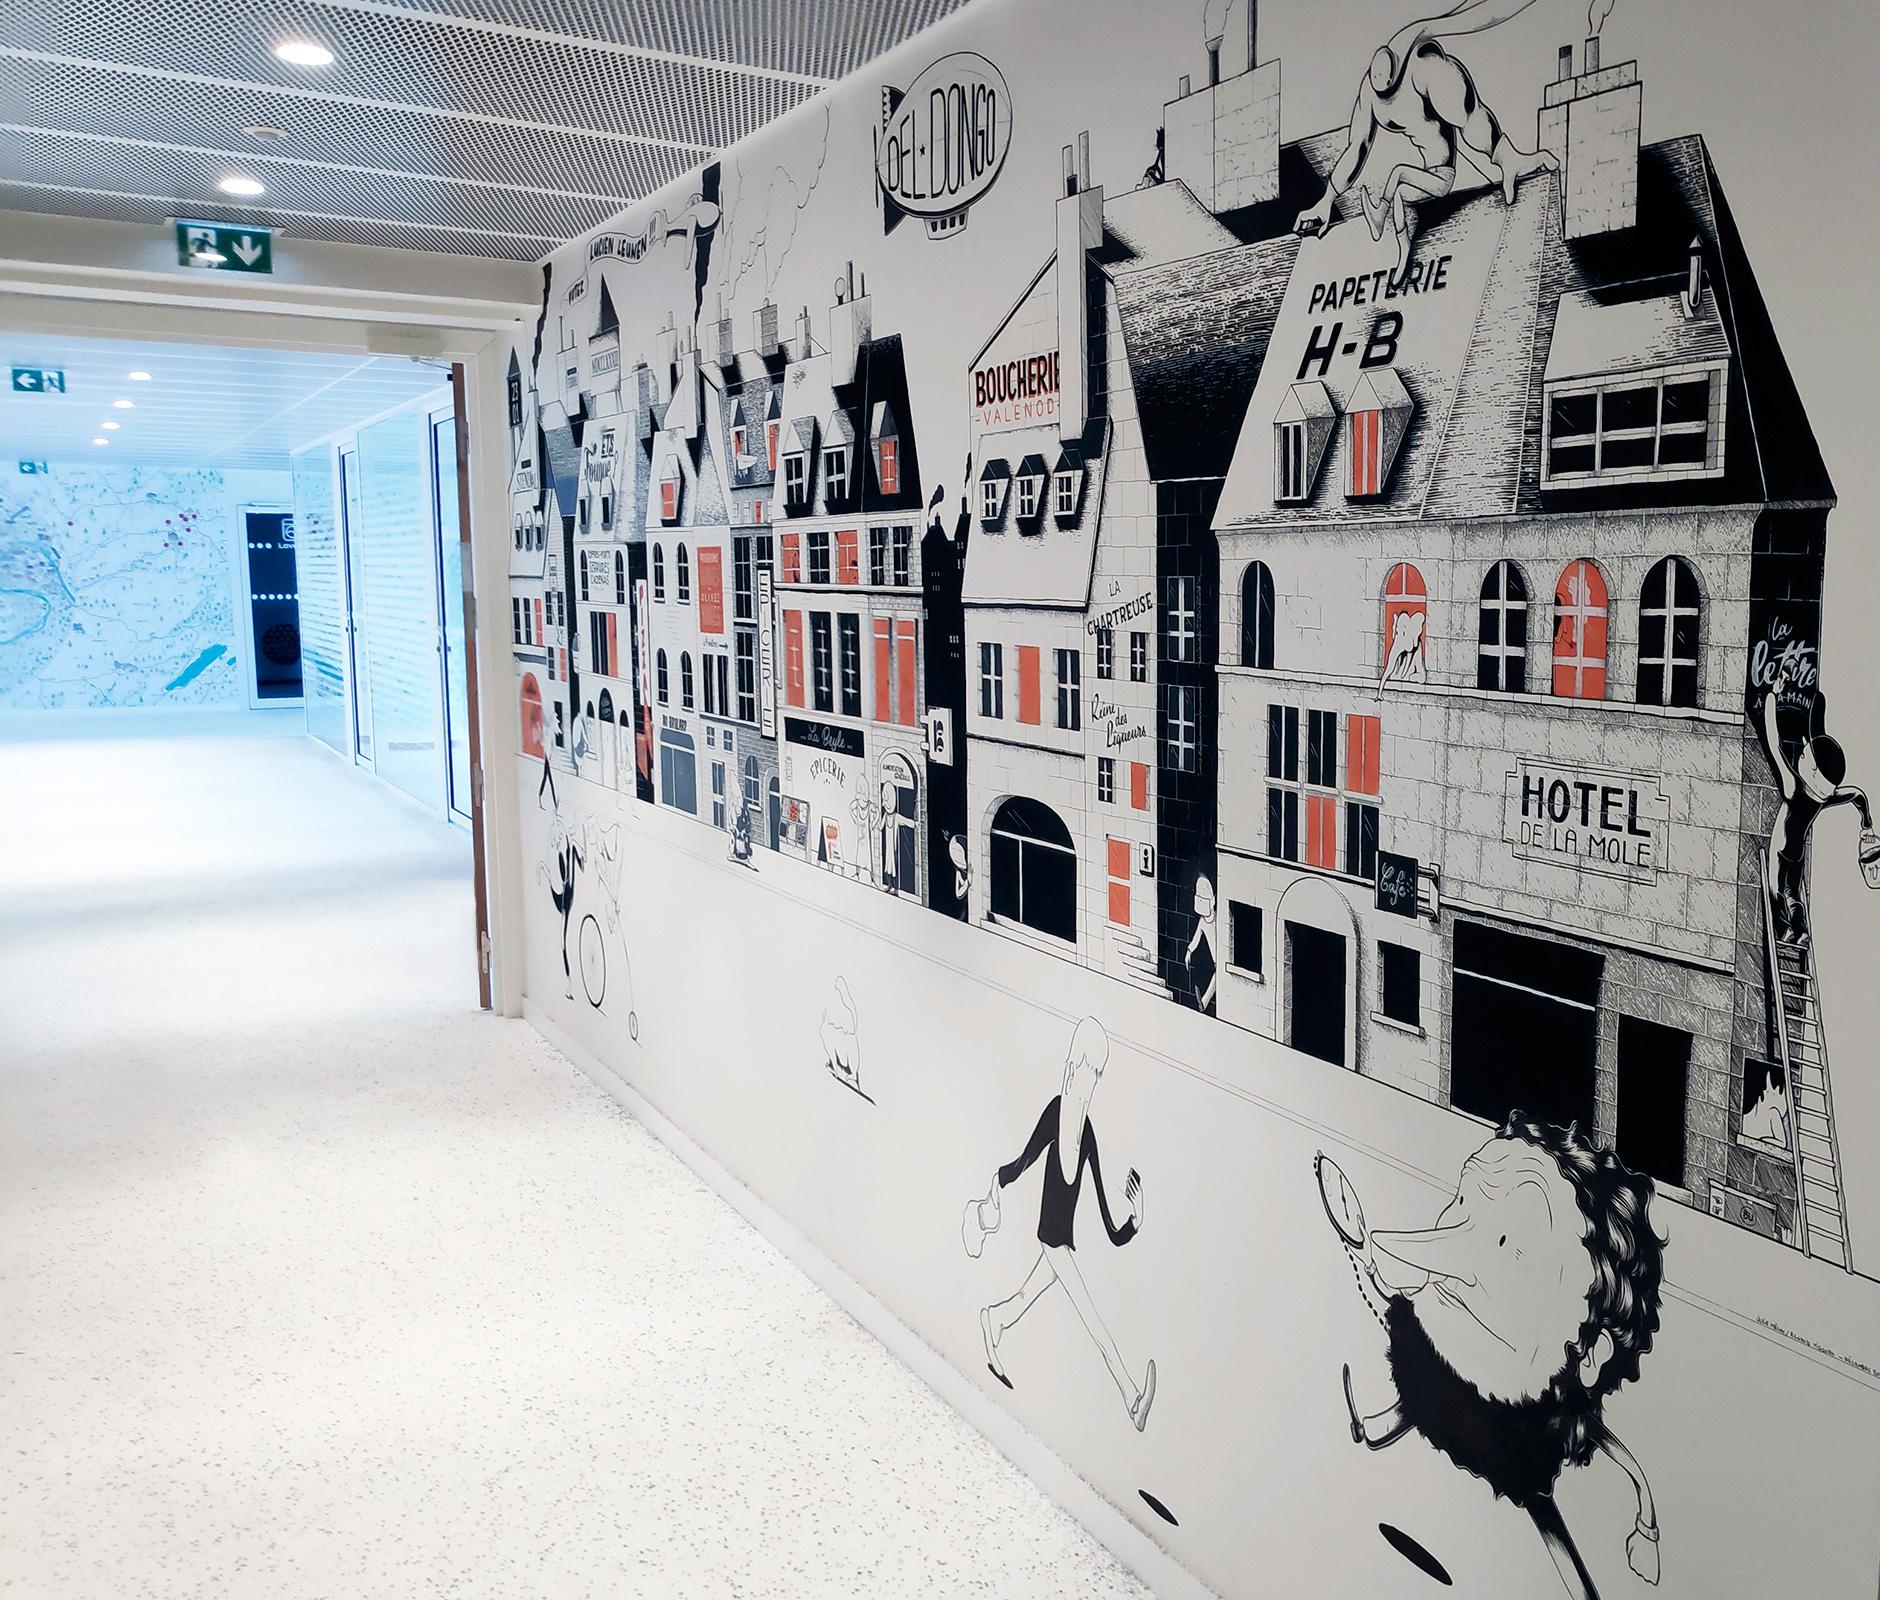 renaud_vigourt_stendhal_mural_0K_adj